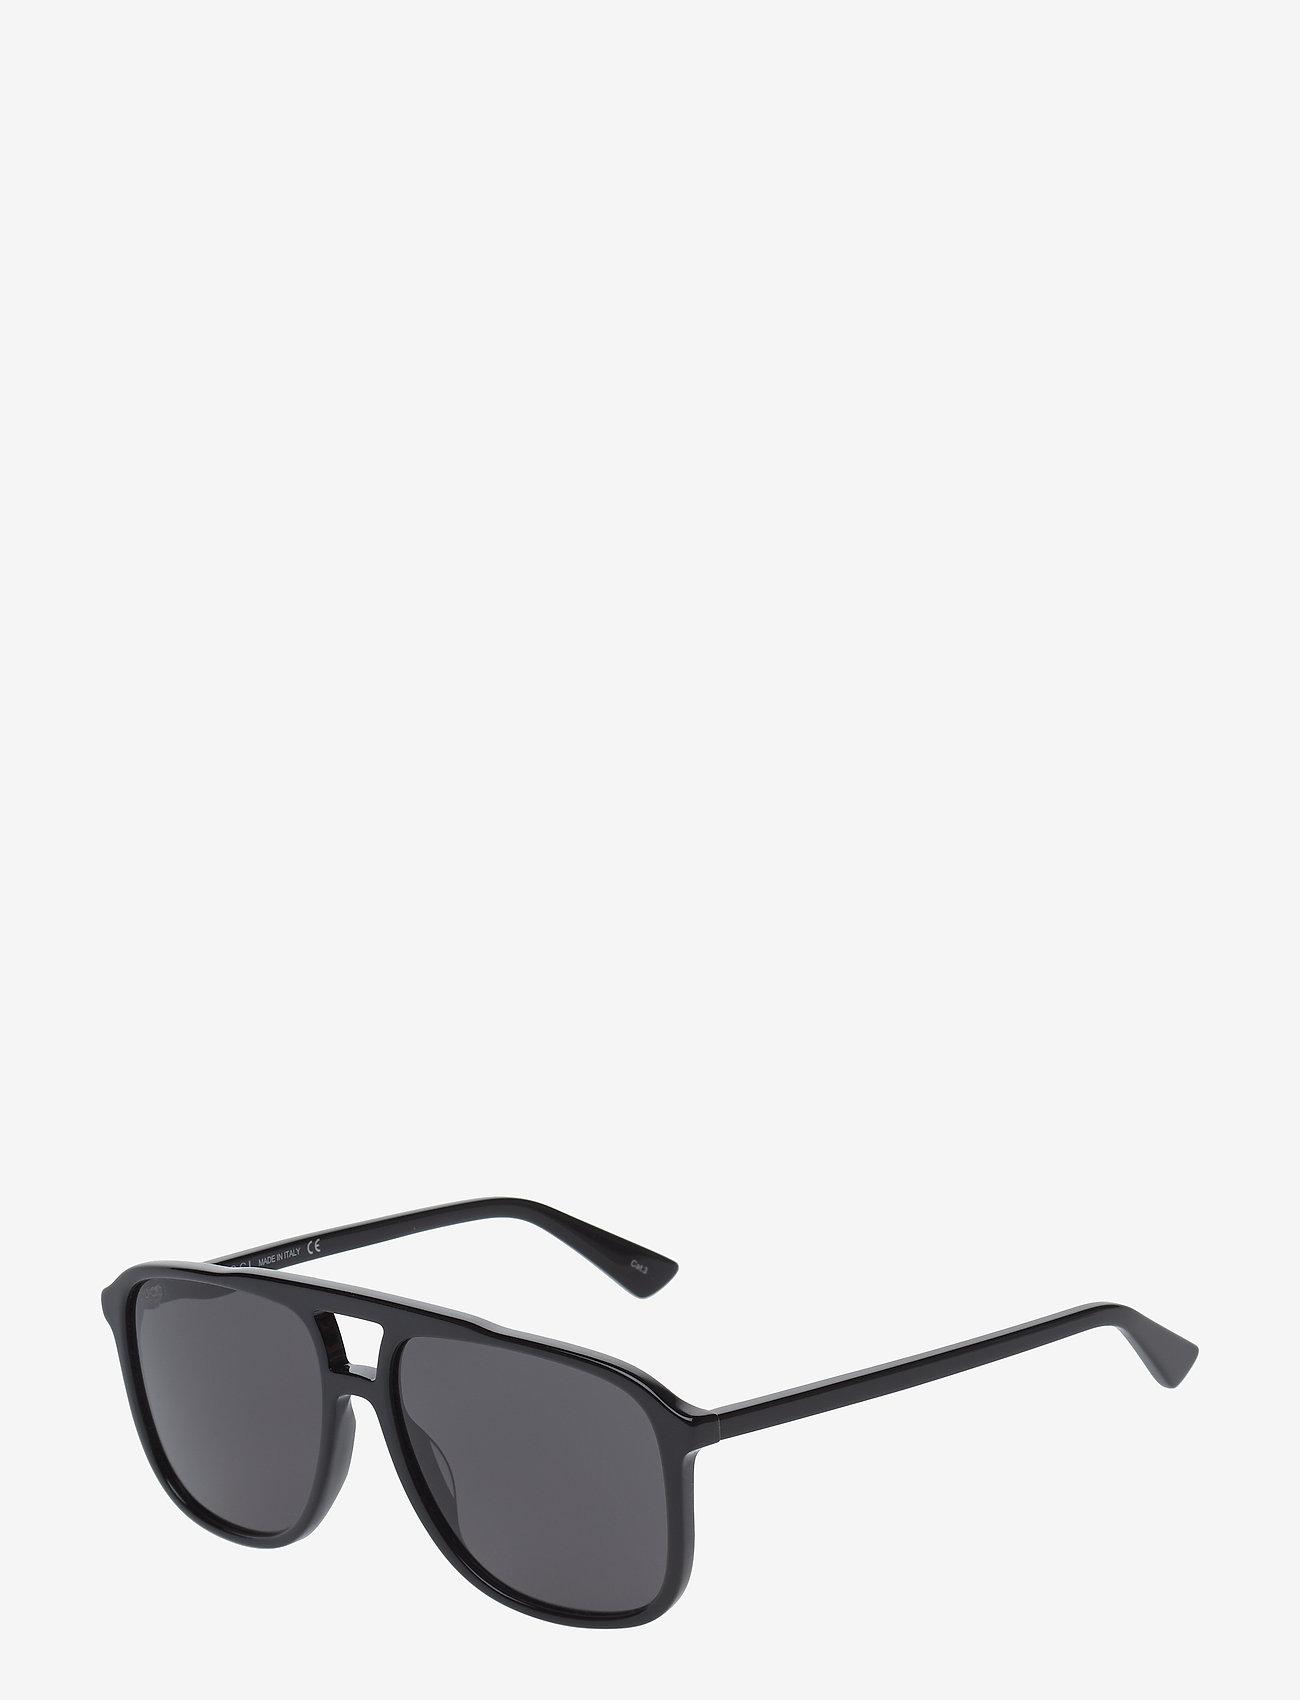 Gucci Sunglasses - GG0262S - pilottilasit - black-black-grey